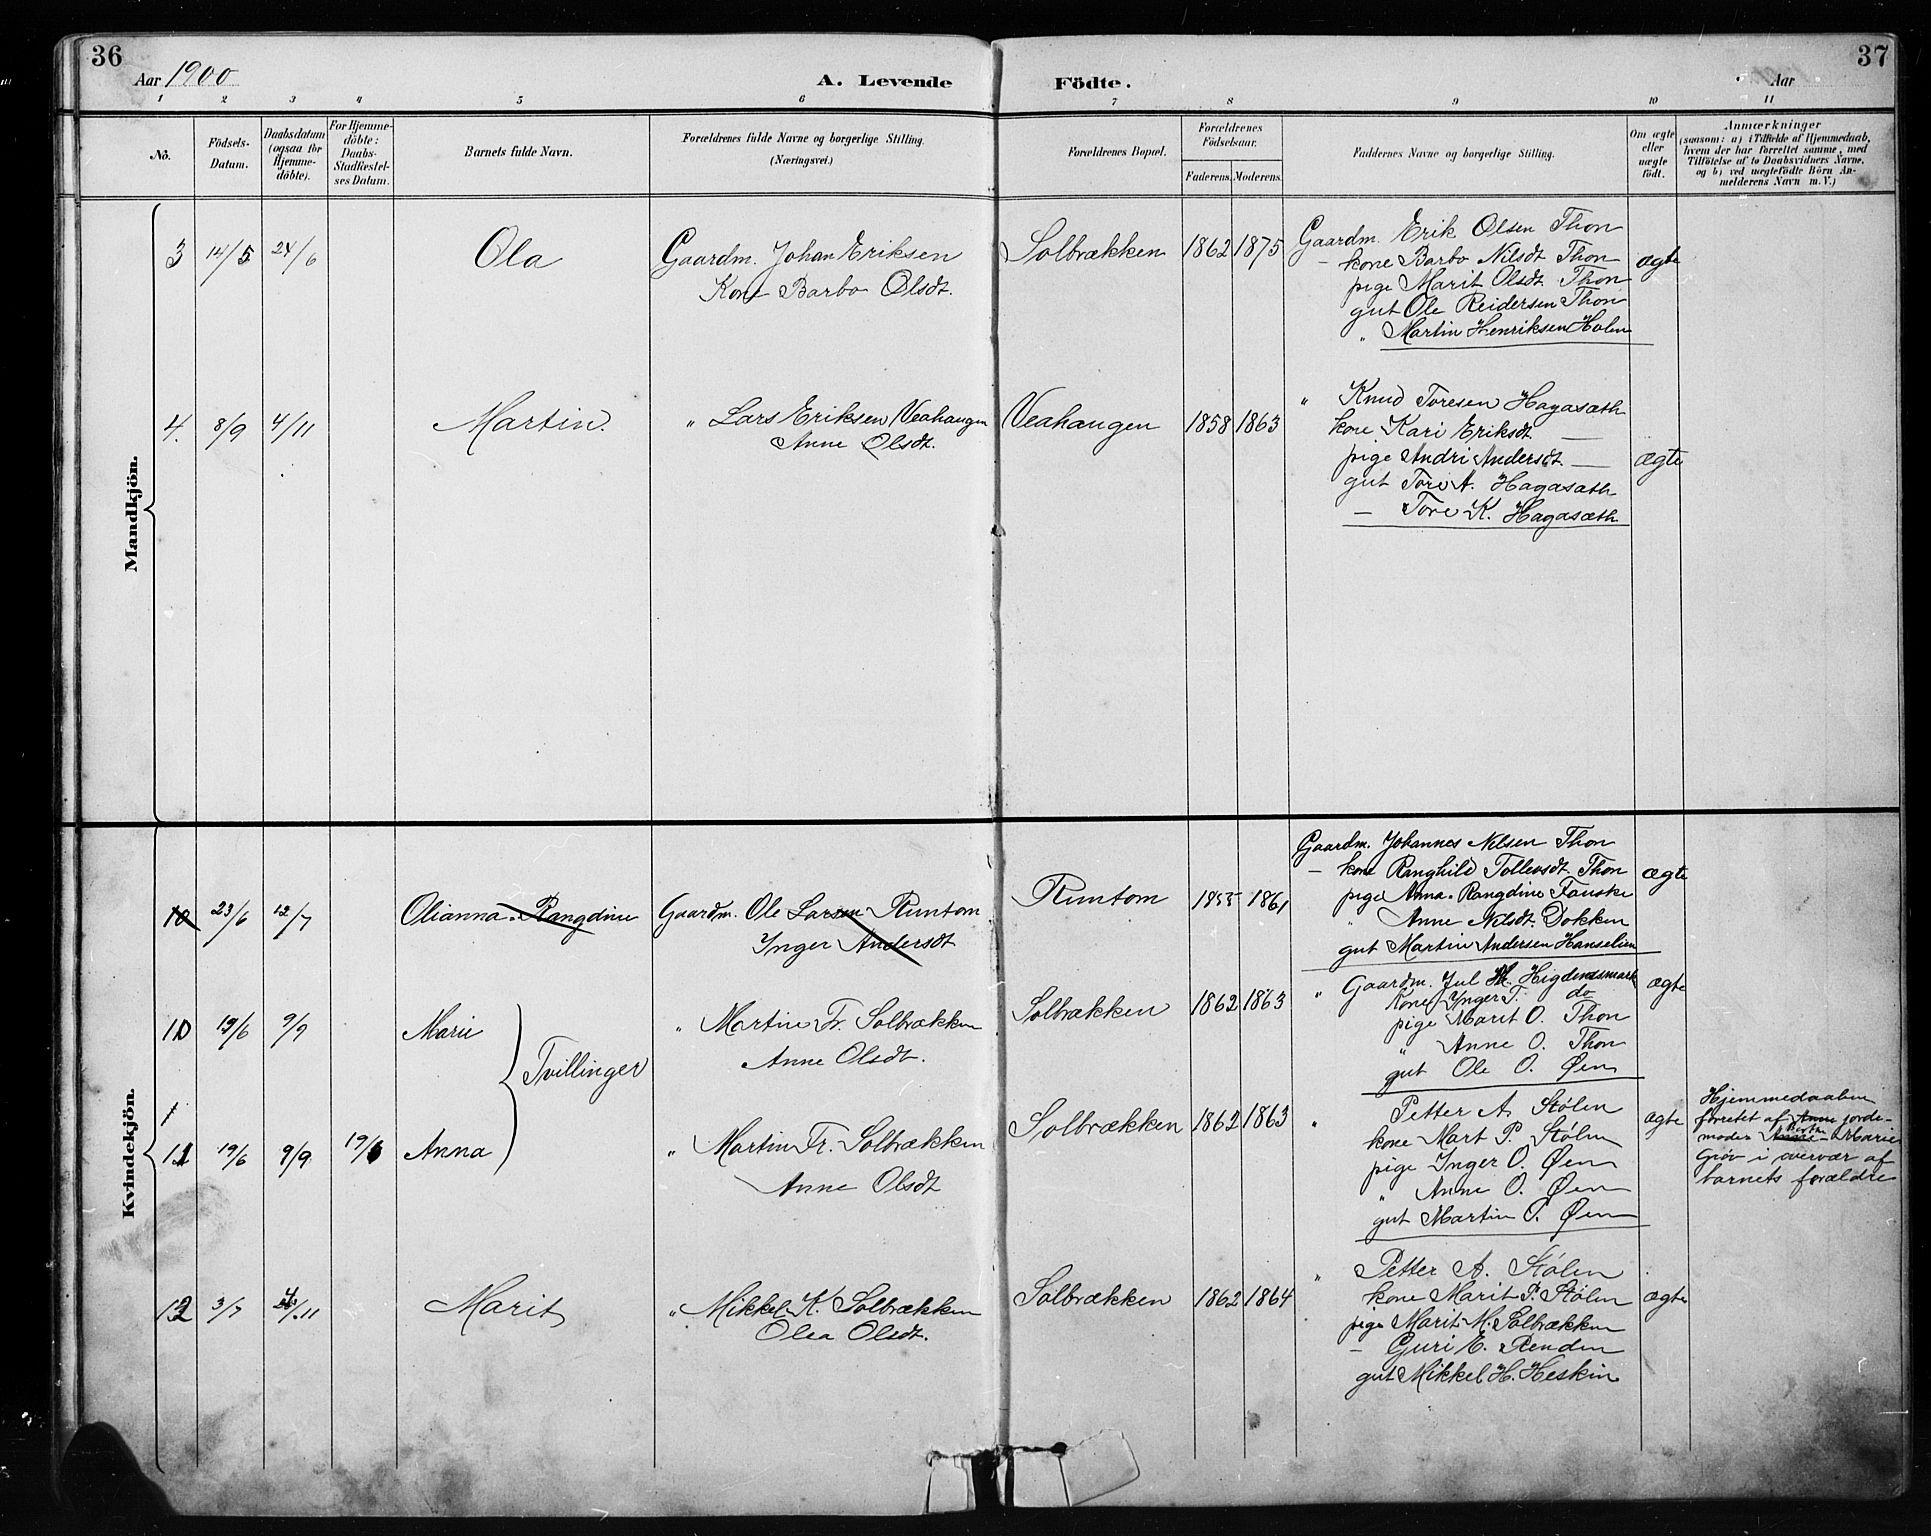 SAH, Etnedal prestekontor, H/Ha/Hab/Habb/L0001: Klokkerbok nr. II 1, 1894-1911, s. 36-37